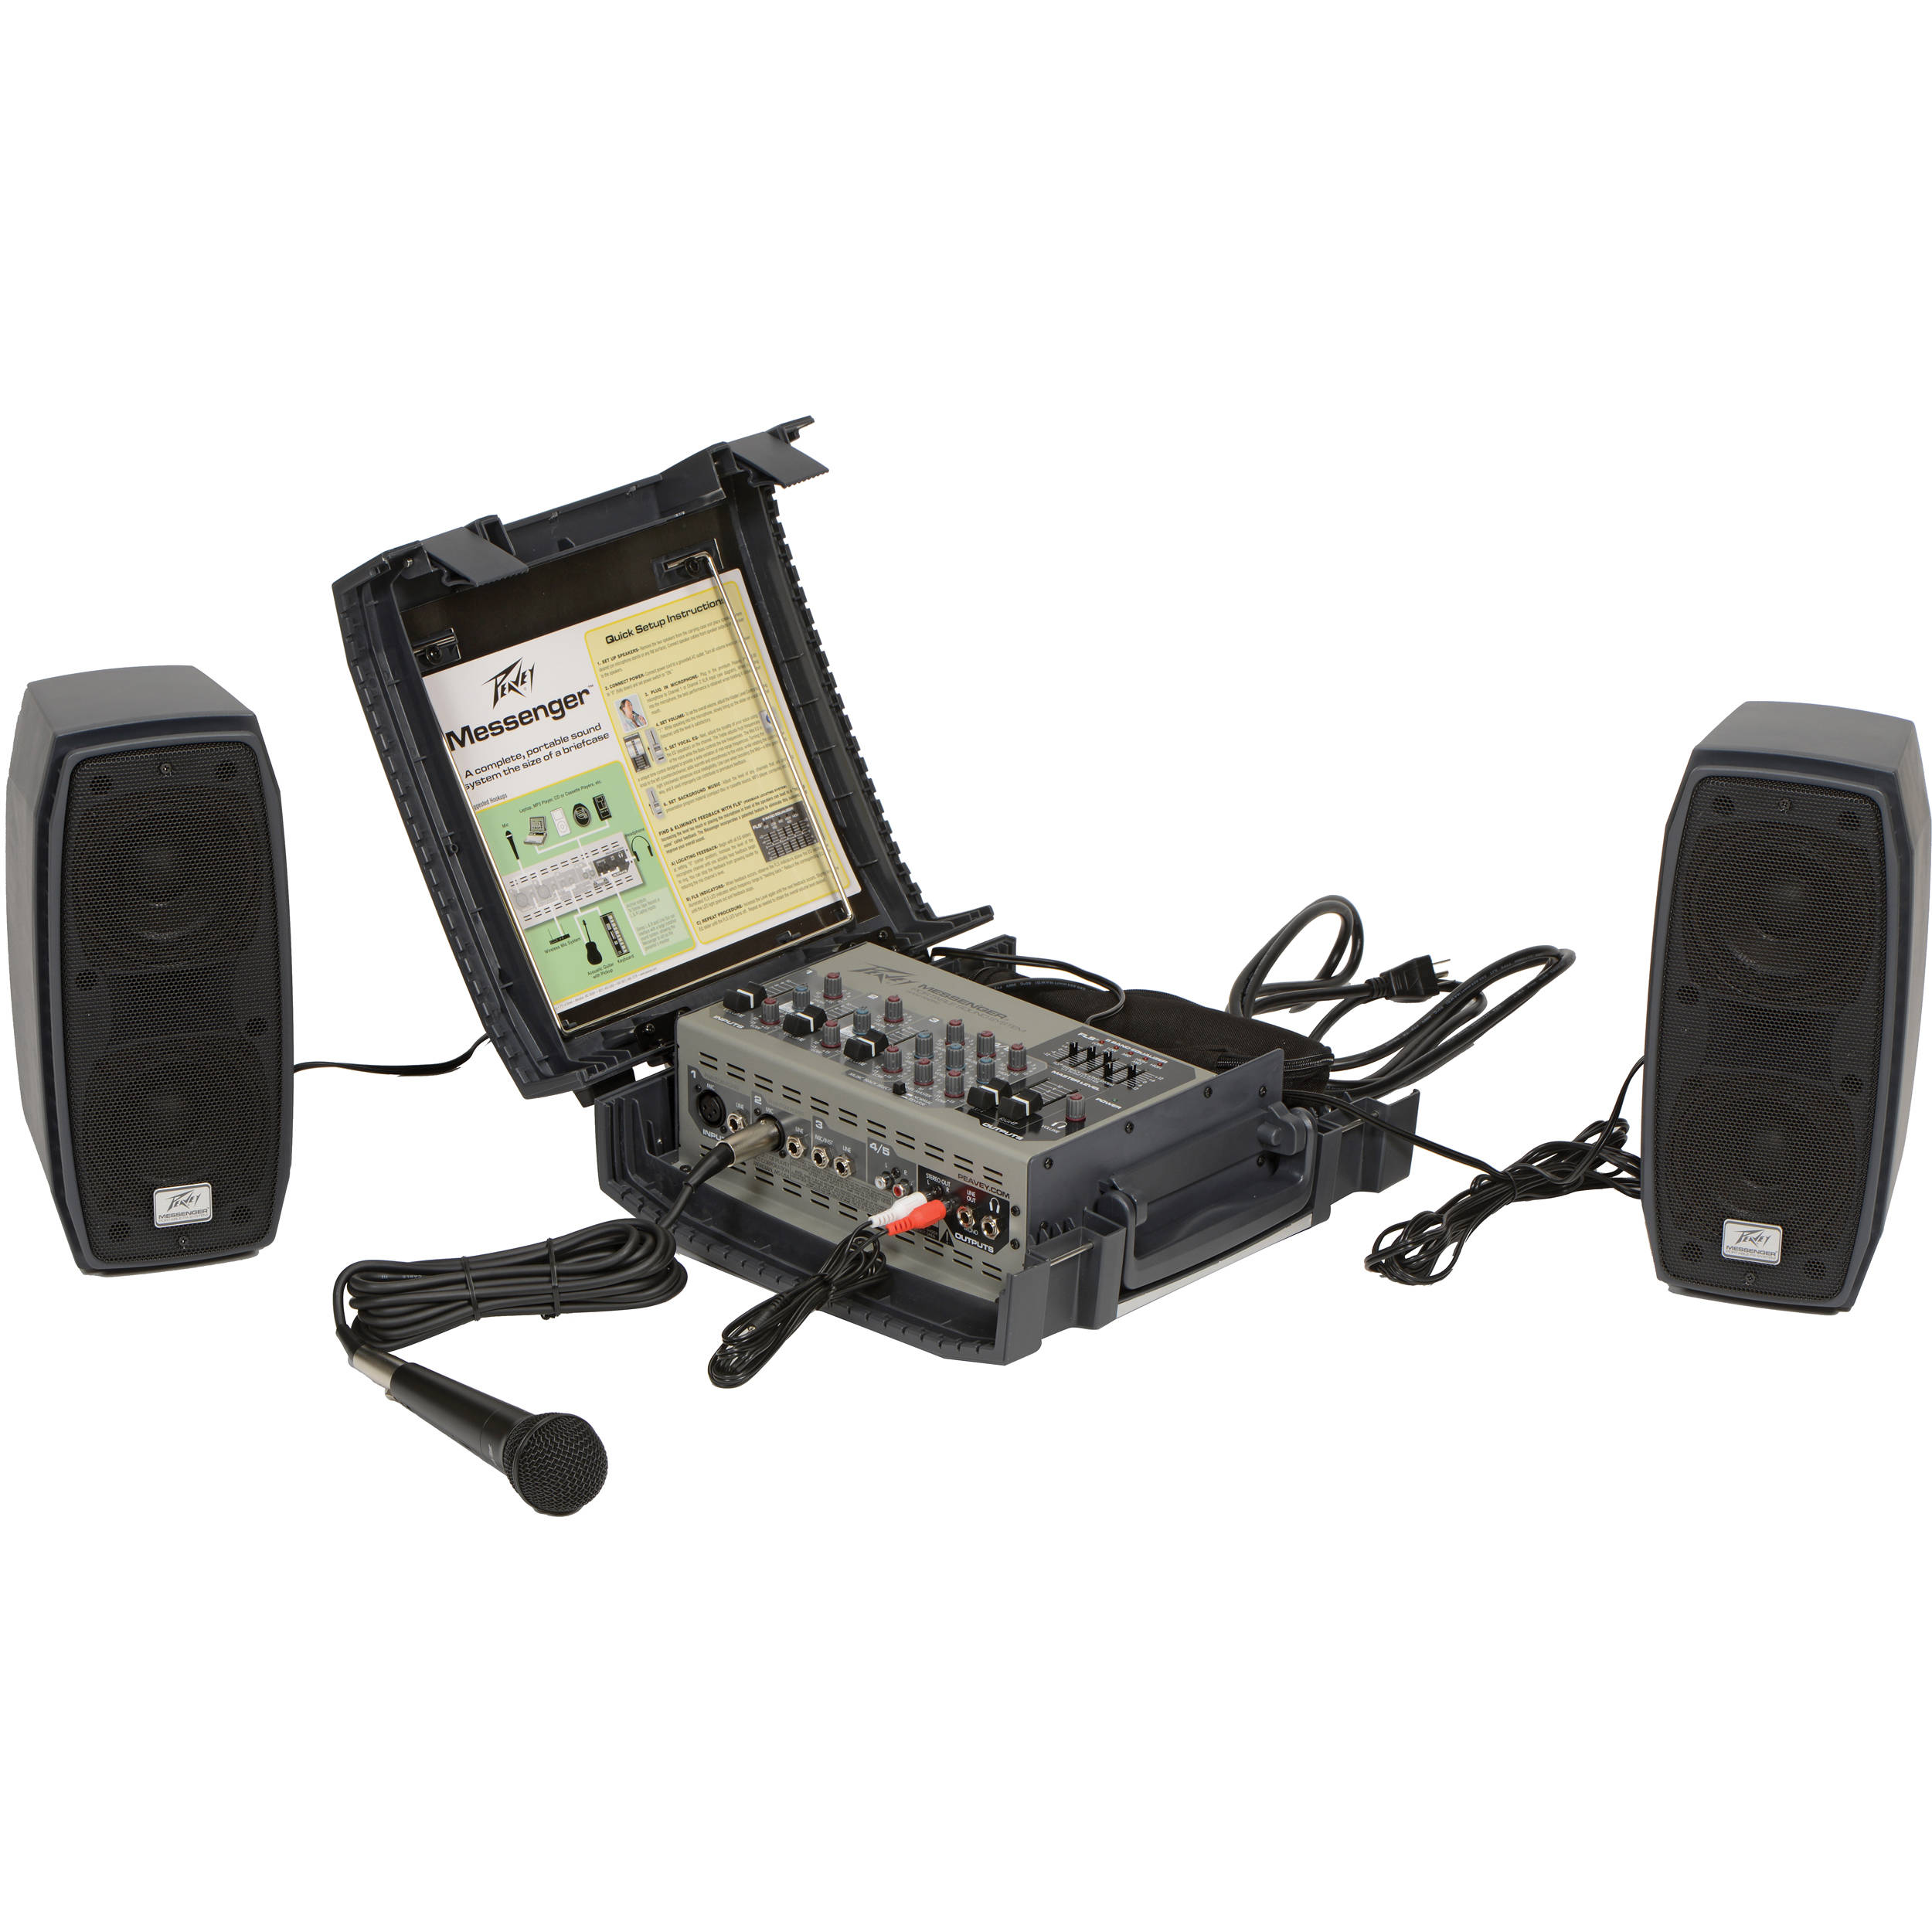 Peavey Messenger 100W Portable Sound System